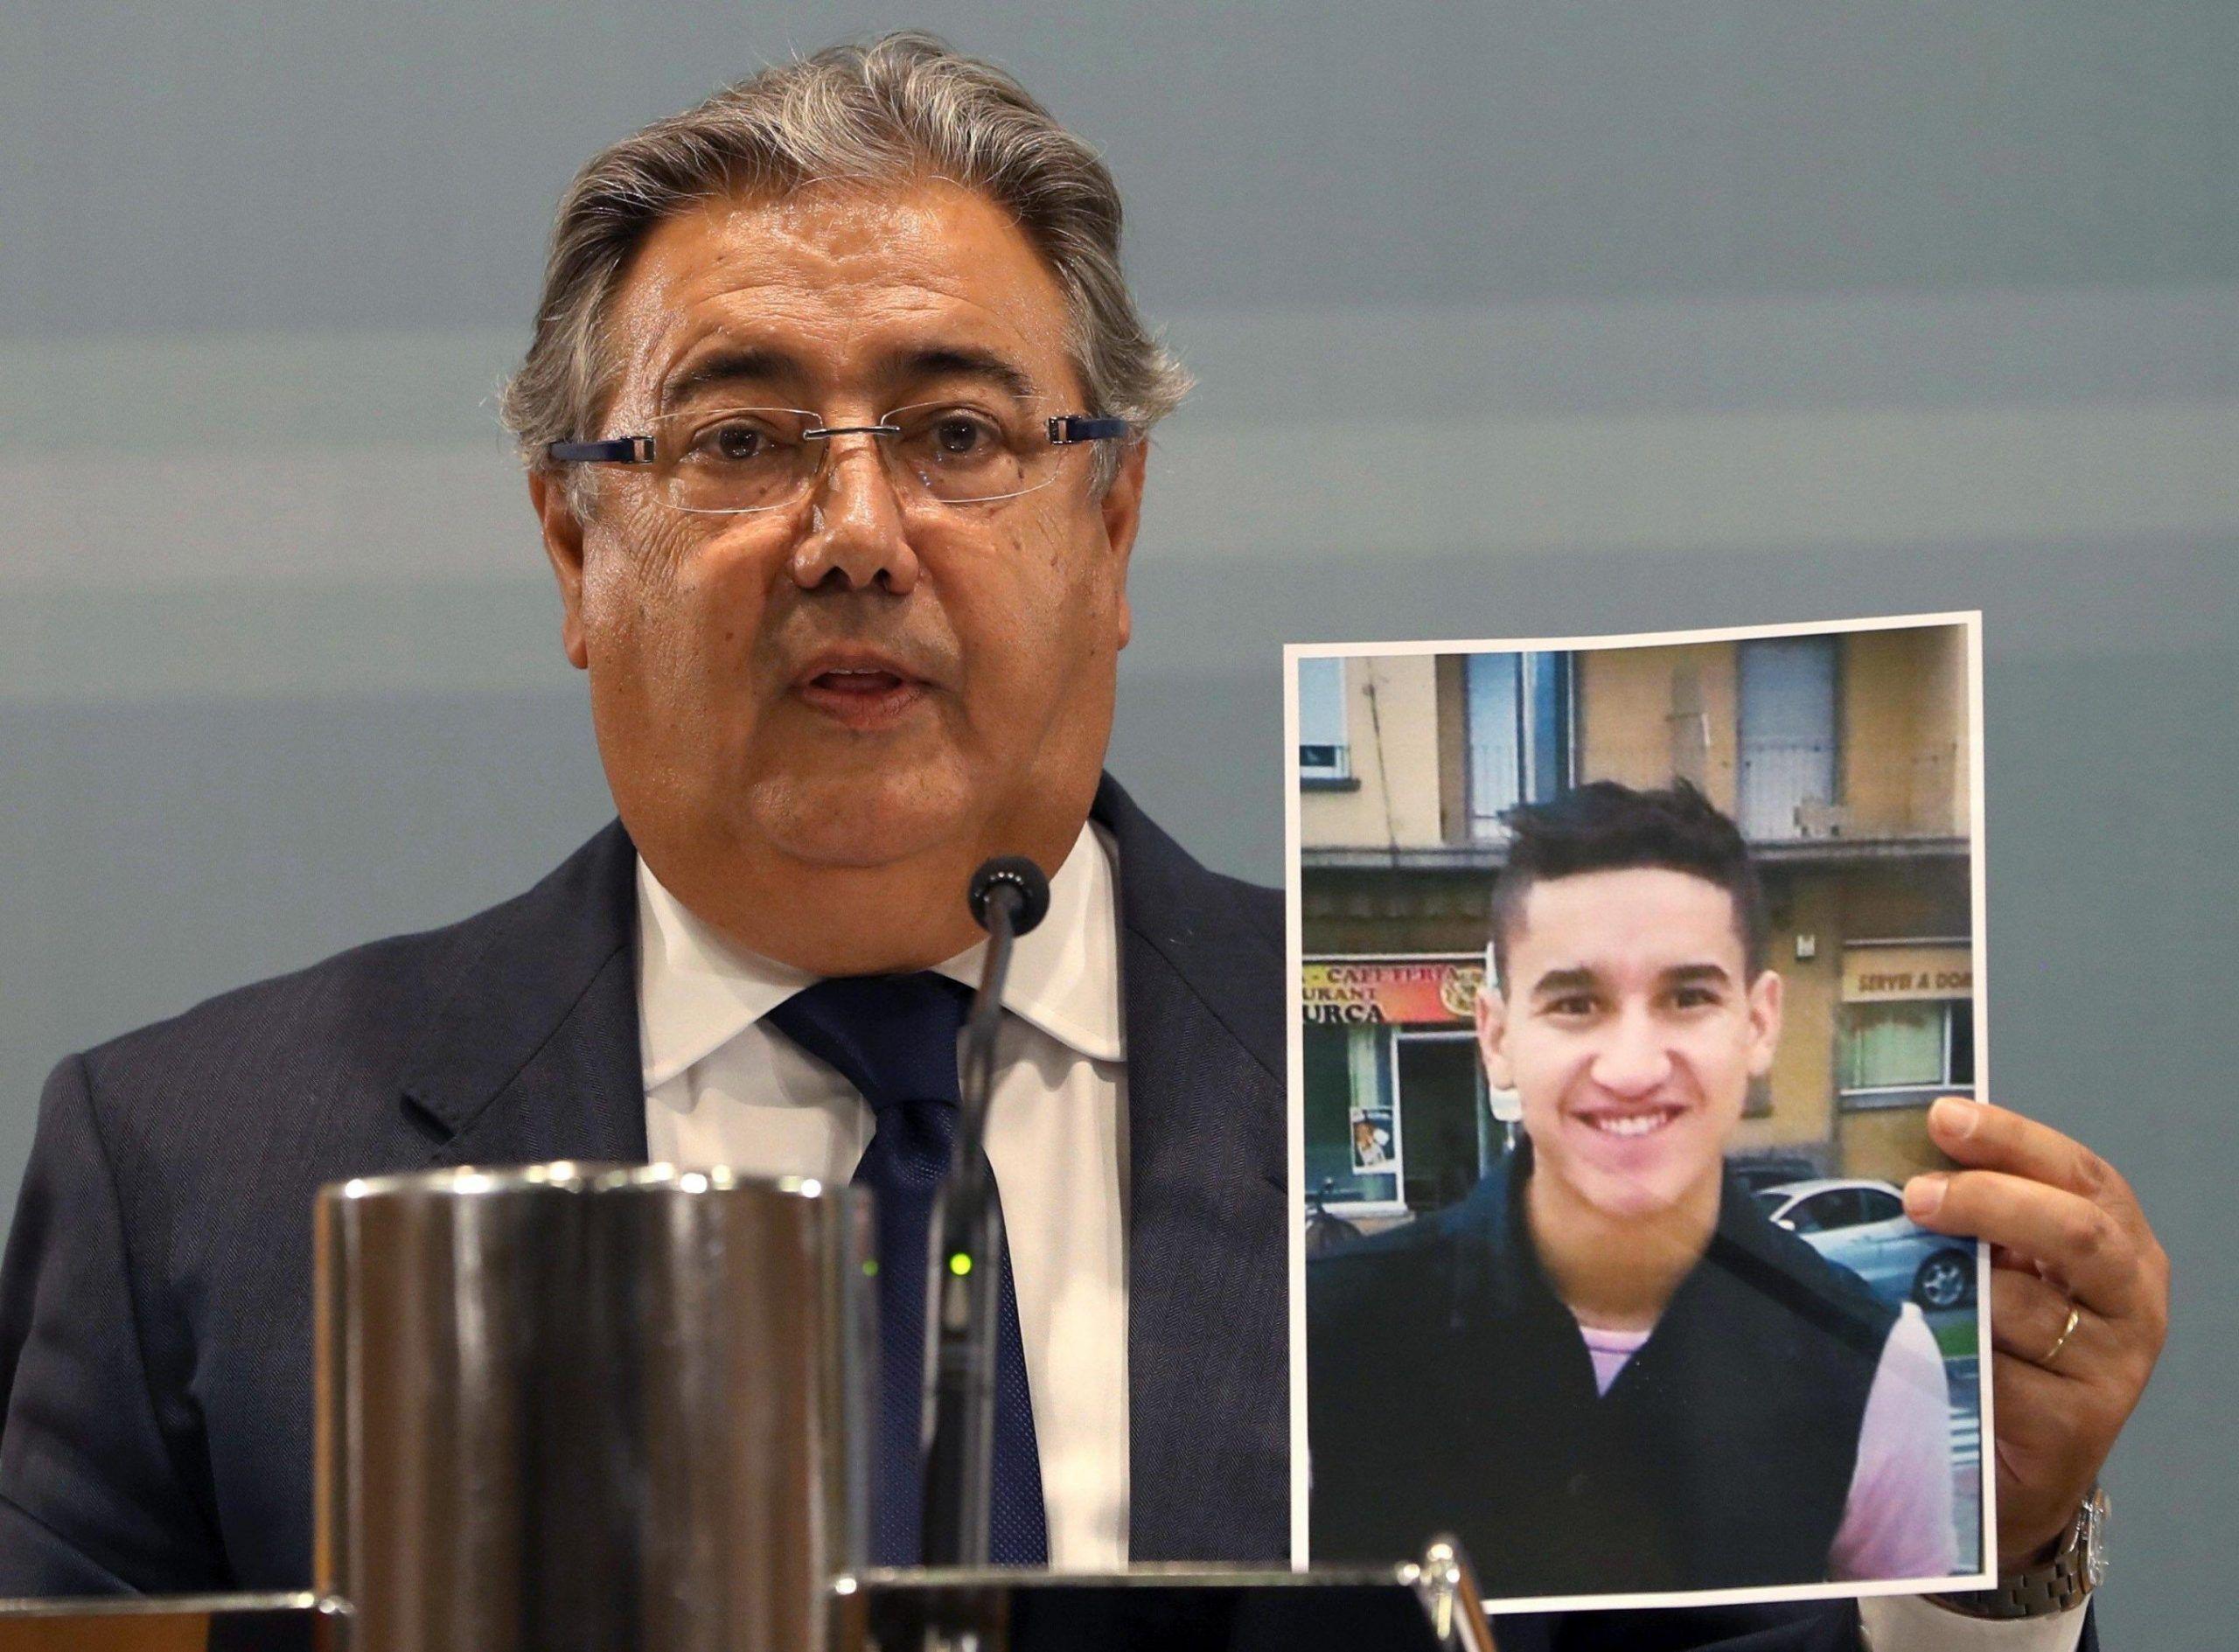 Attentato Barcellona: Younes Abouyaaqoub ucciso a Sant Sadurní d'Anoia